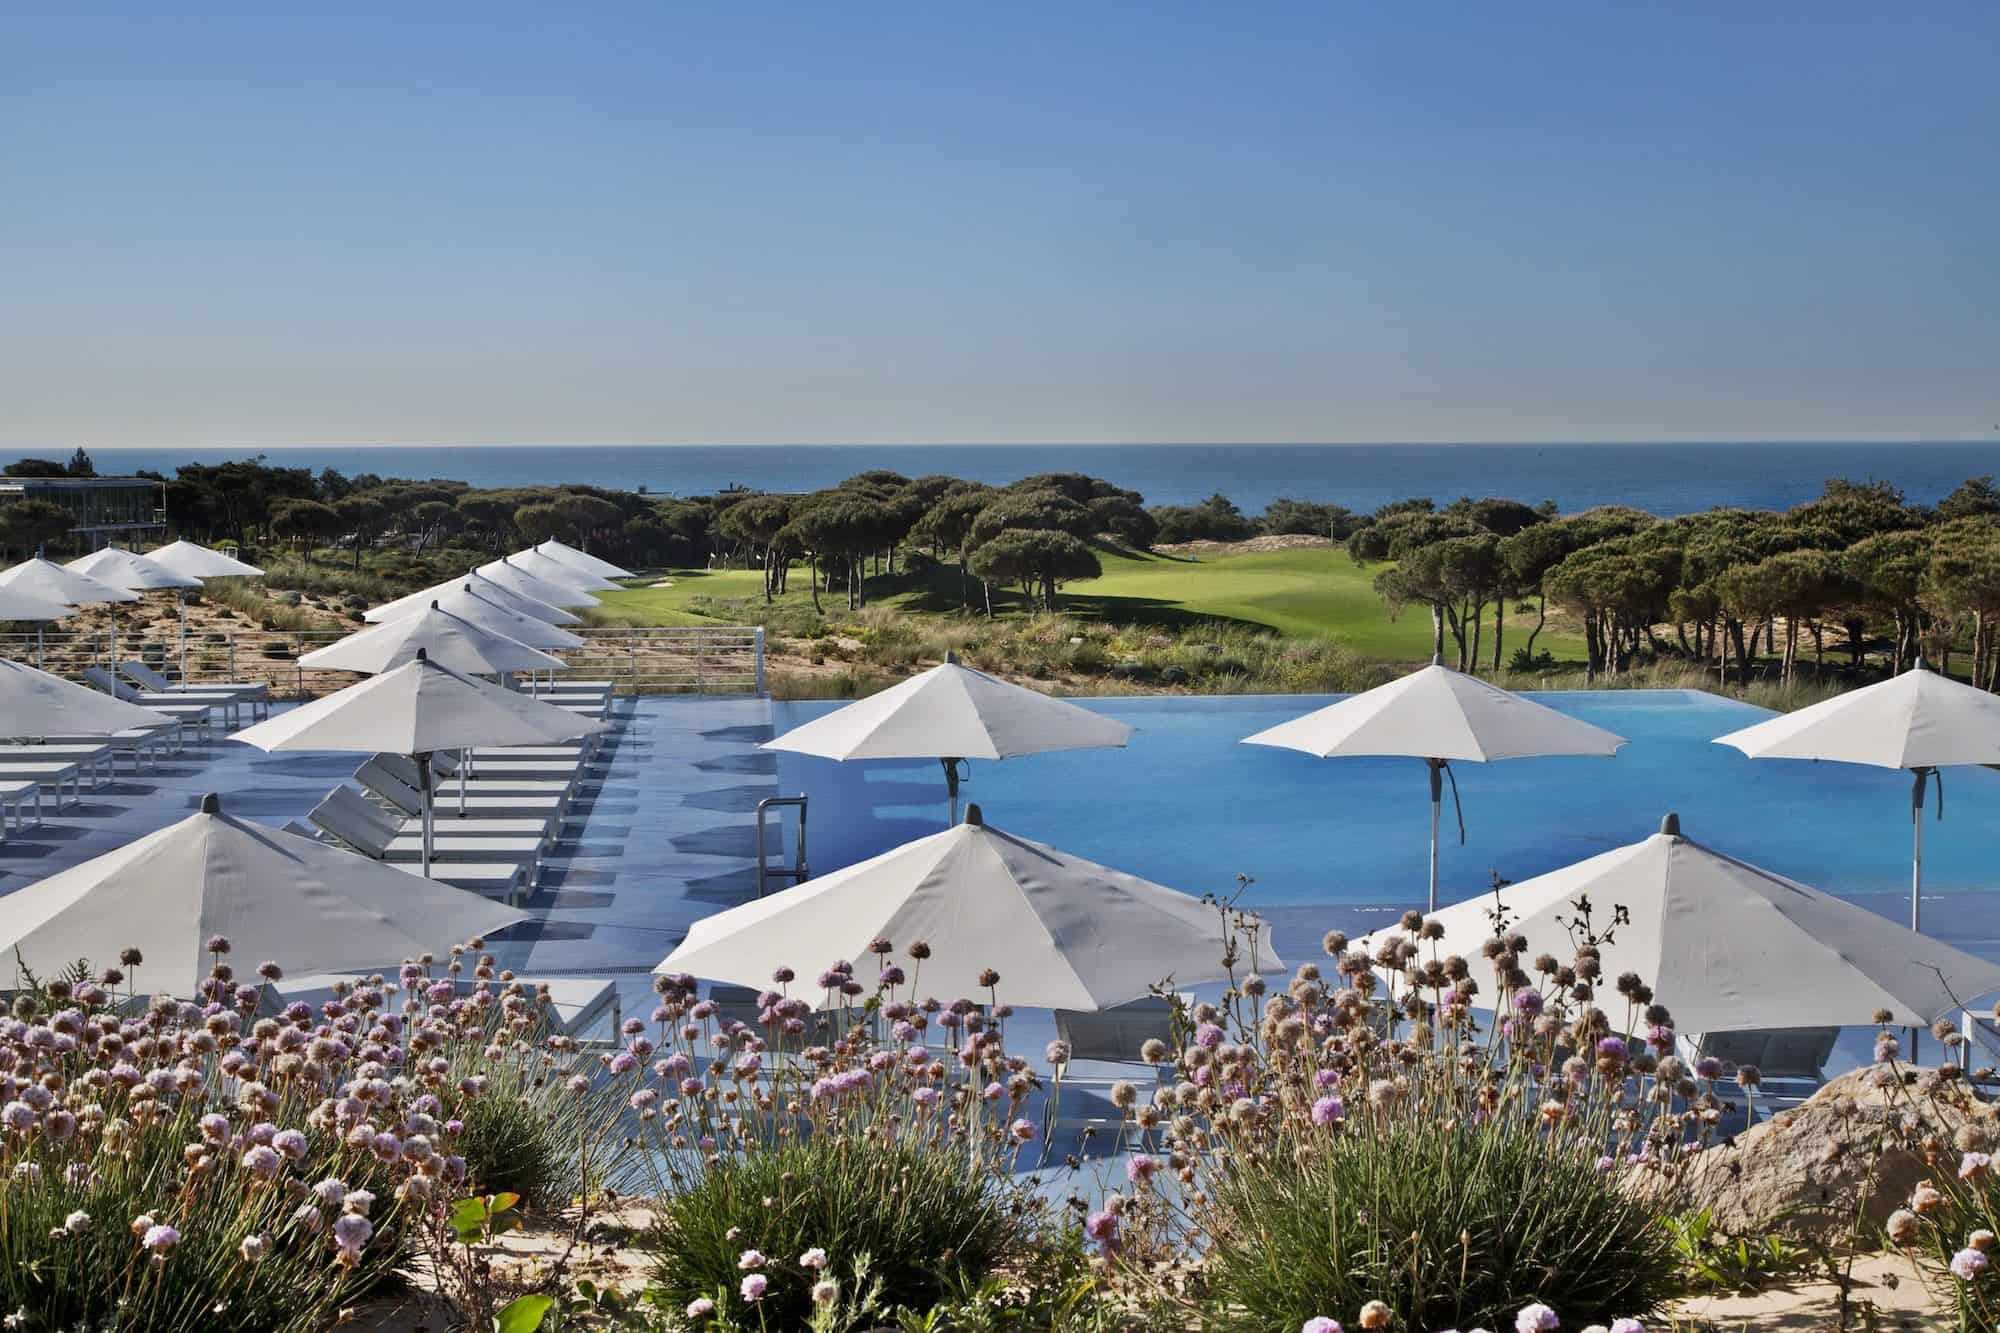 Oitavos Hotel, Portugal: A family-friendly gem